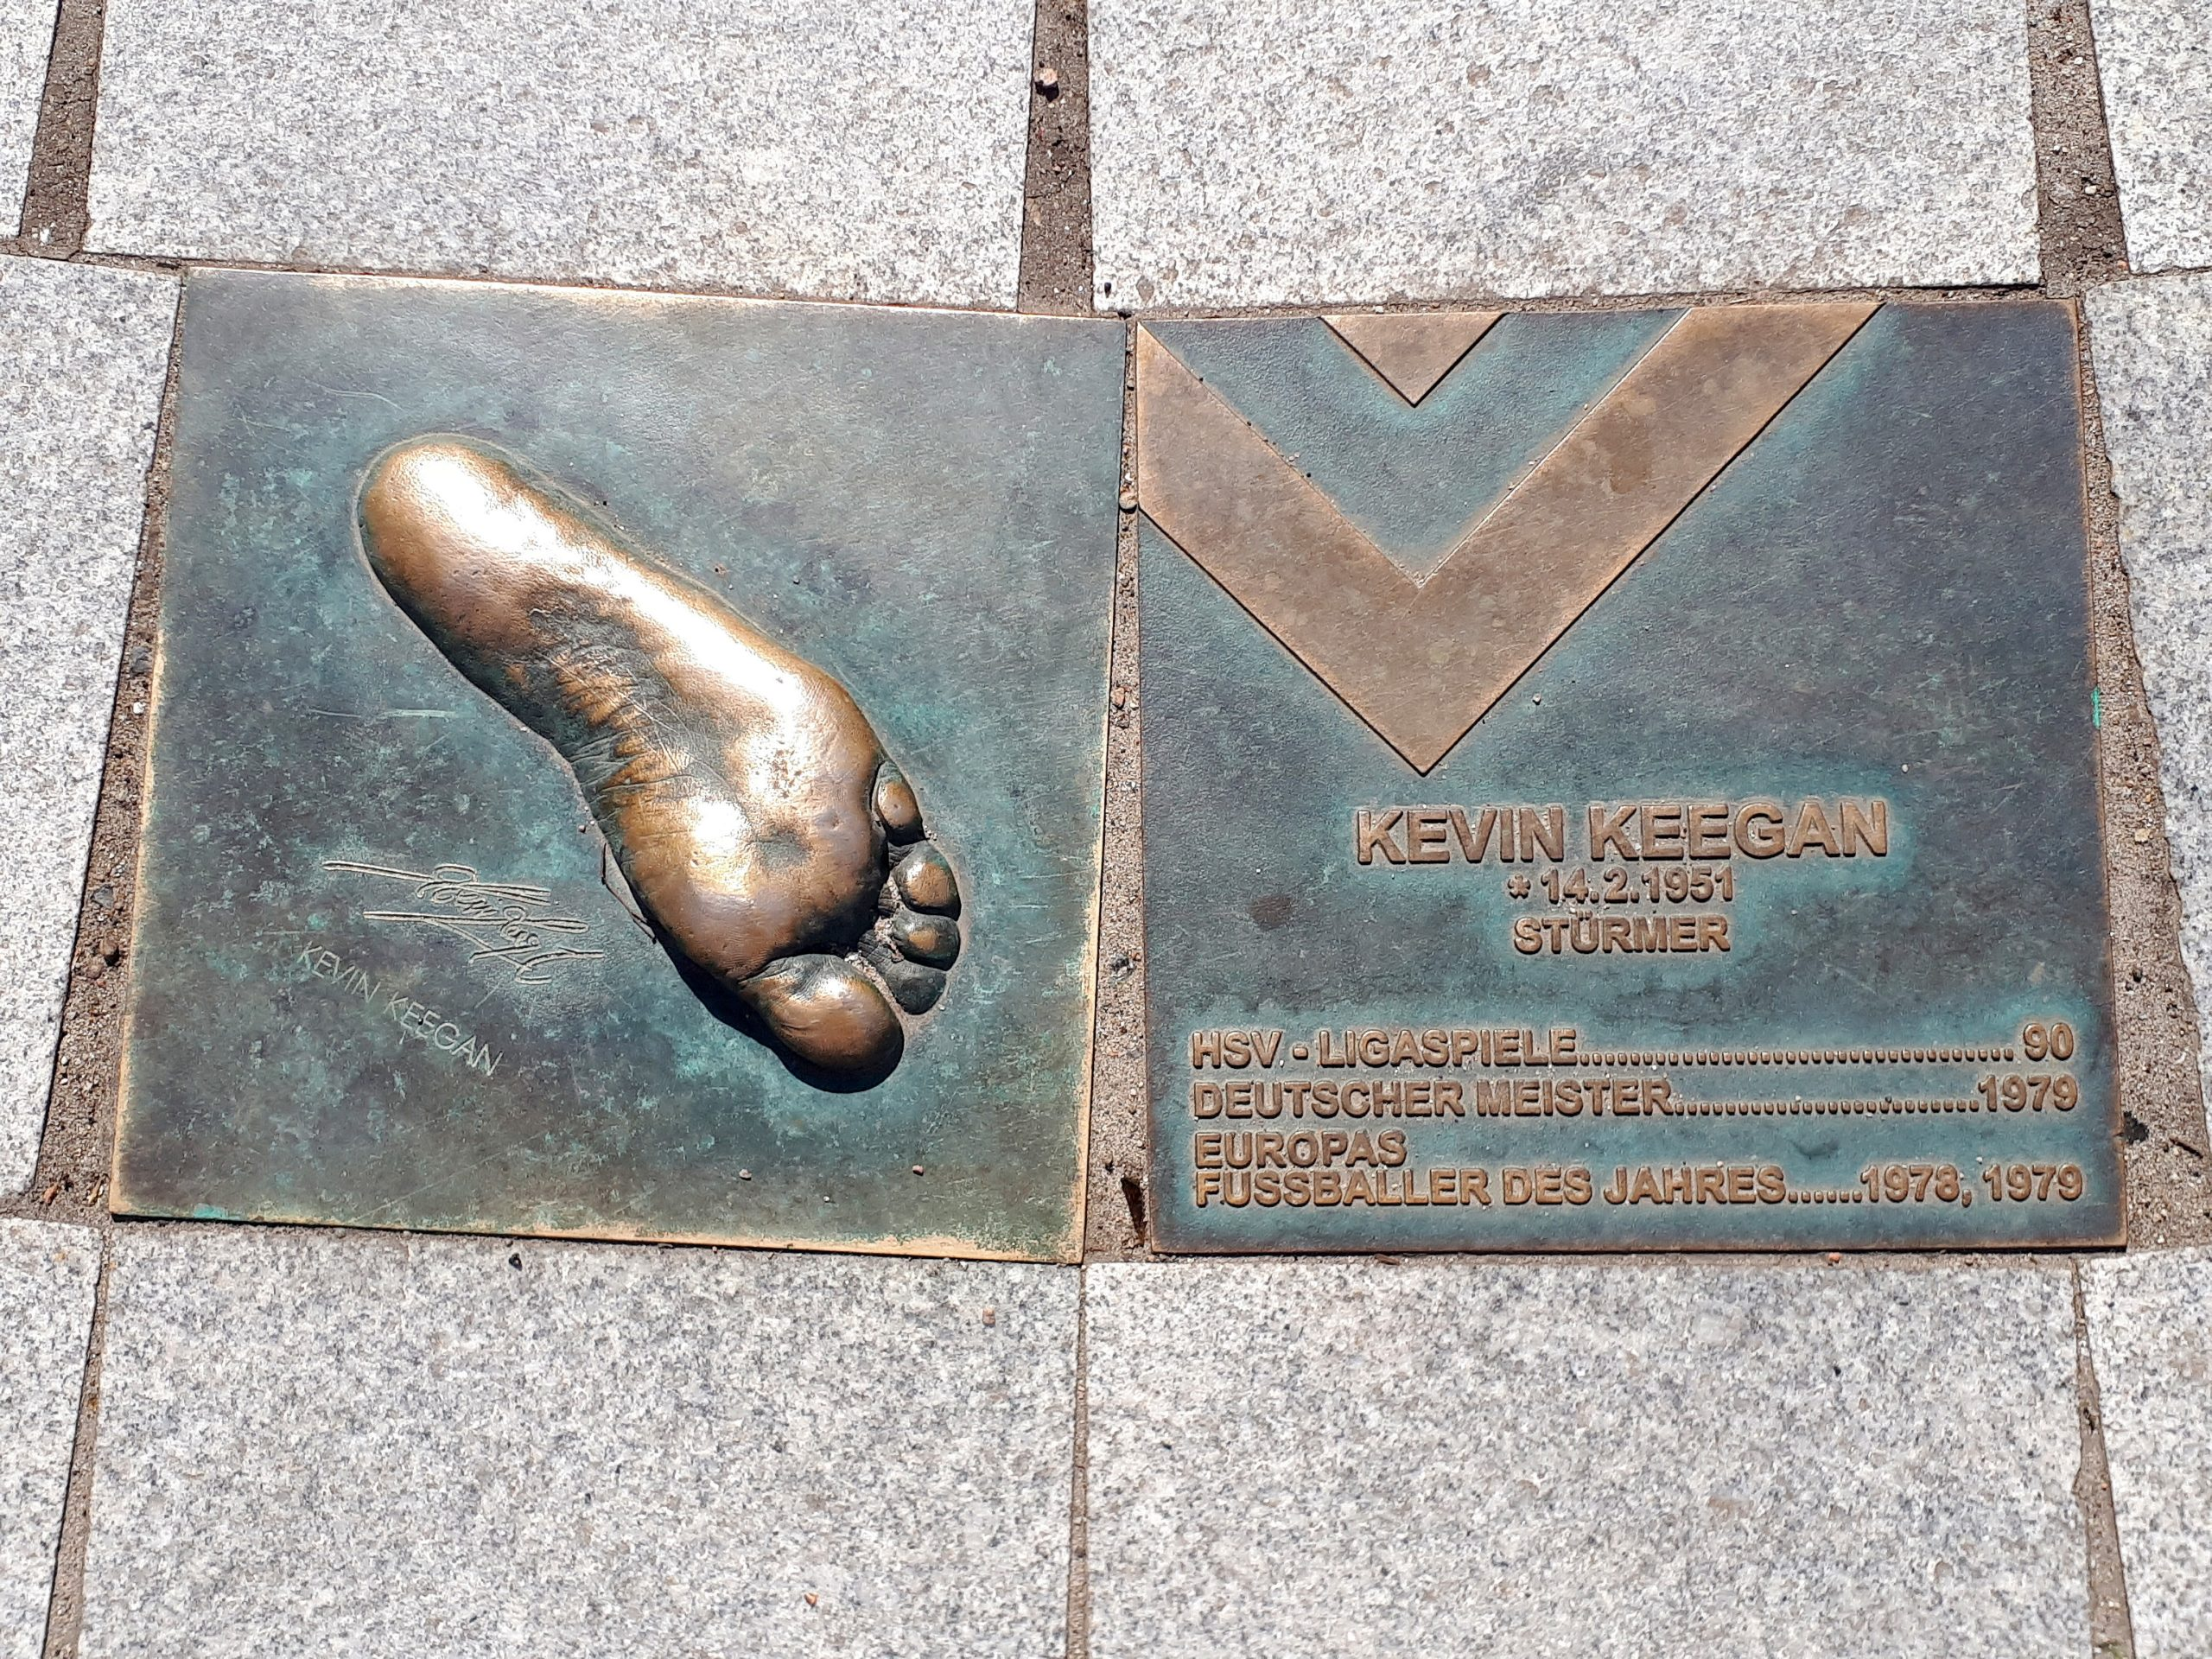 Der Walk of Fame: Kevin Keegan